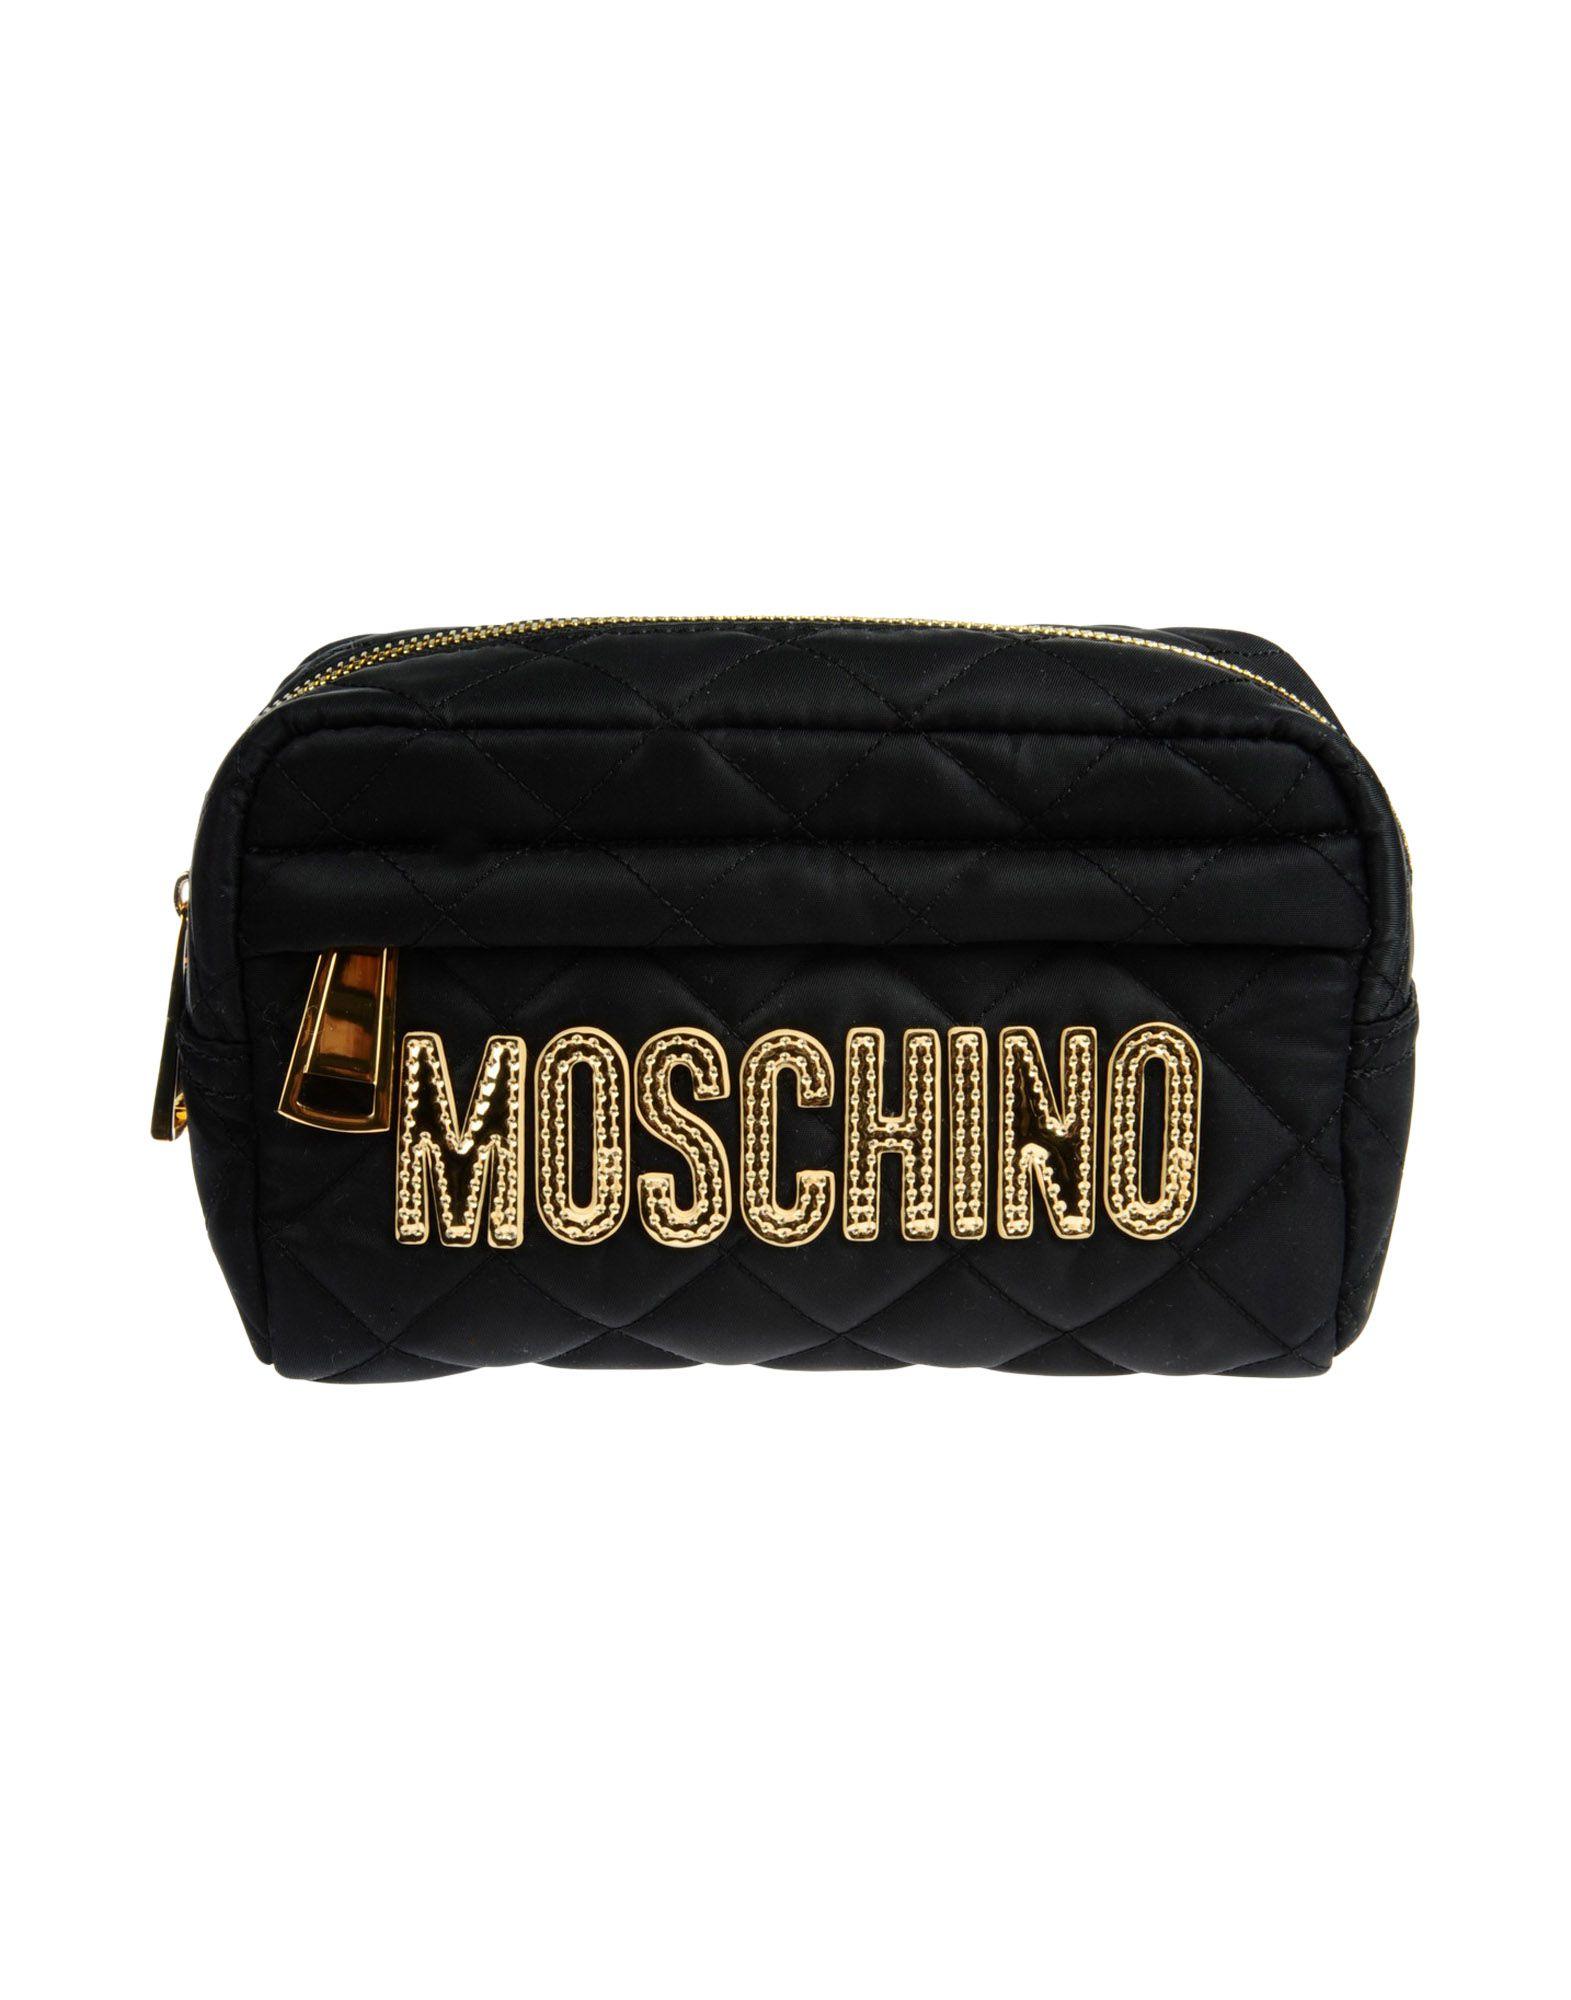 MOSCHINO Beauty case v°73 beauty case